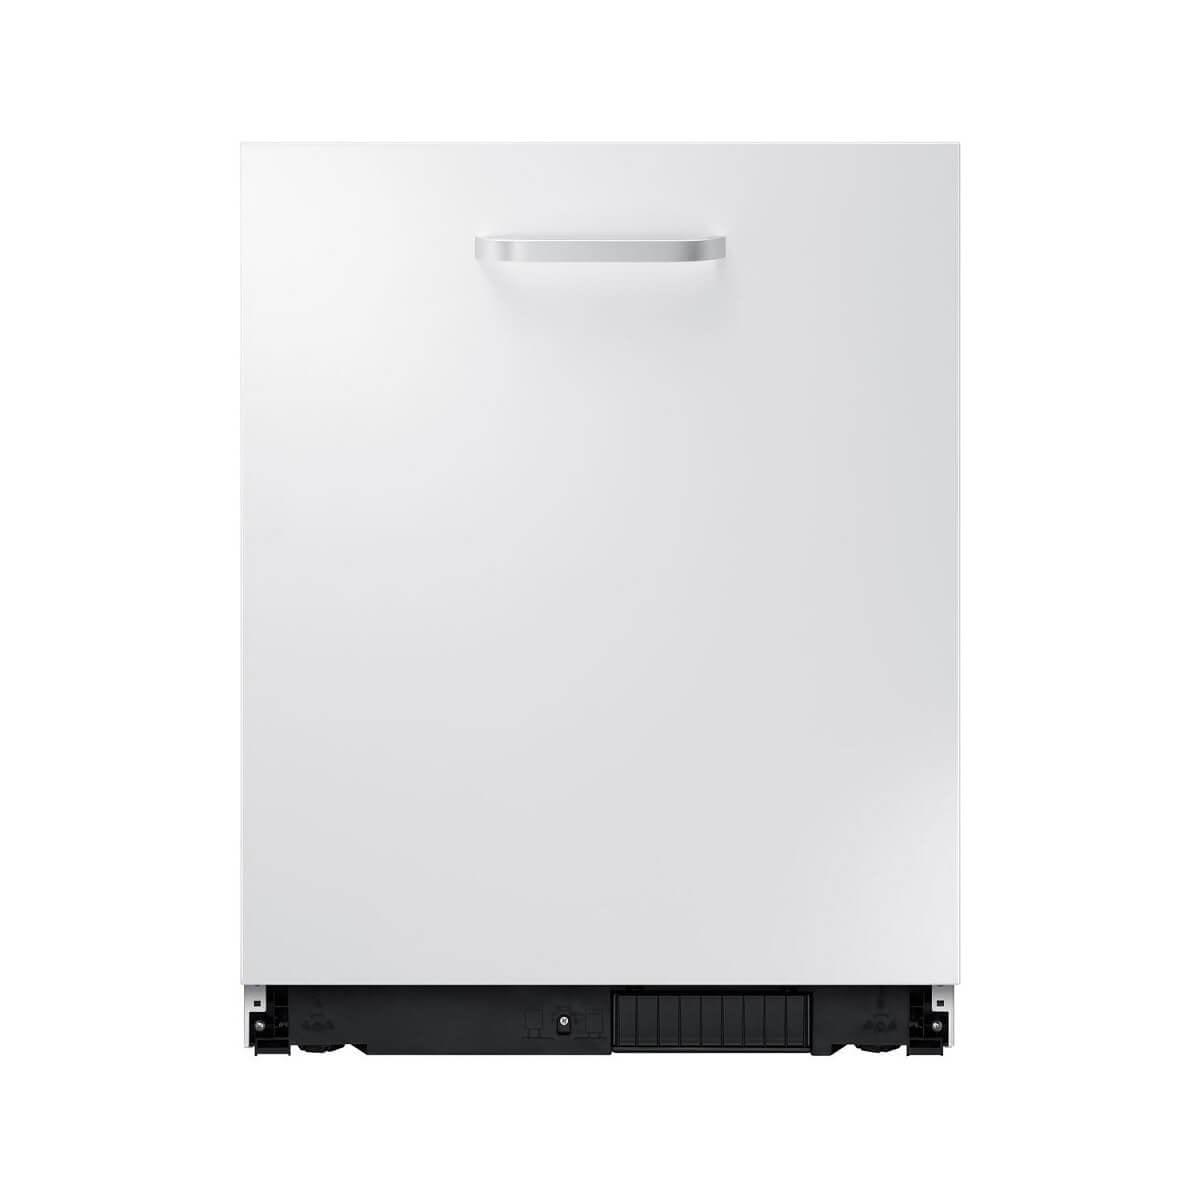 Samsung DW60M5050BB Bulaşık Makinesi